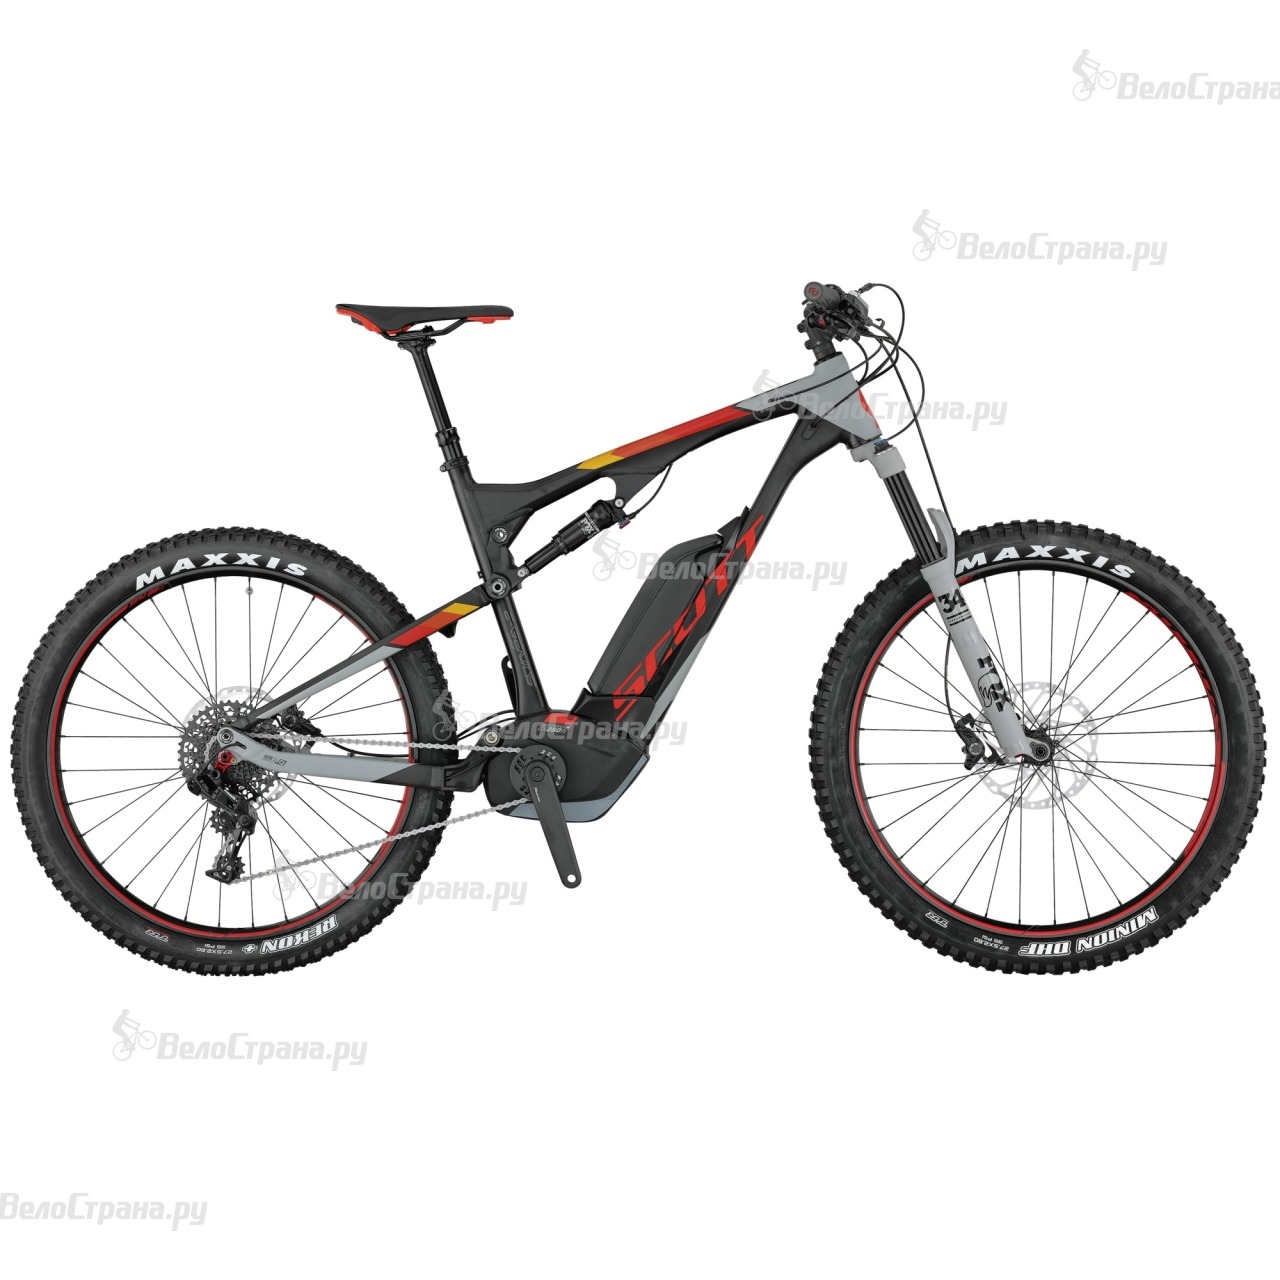 Велосипед Scott E-Genius 720 Plus (2017) genius hs 300a silver